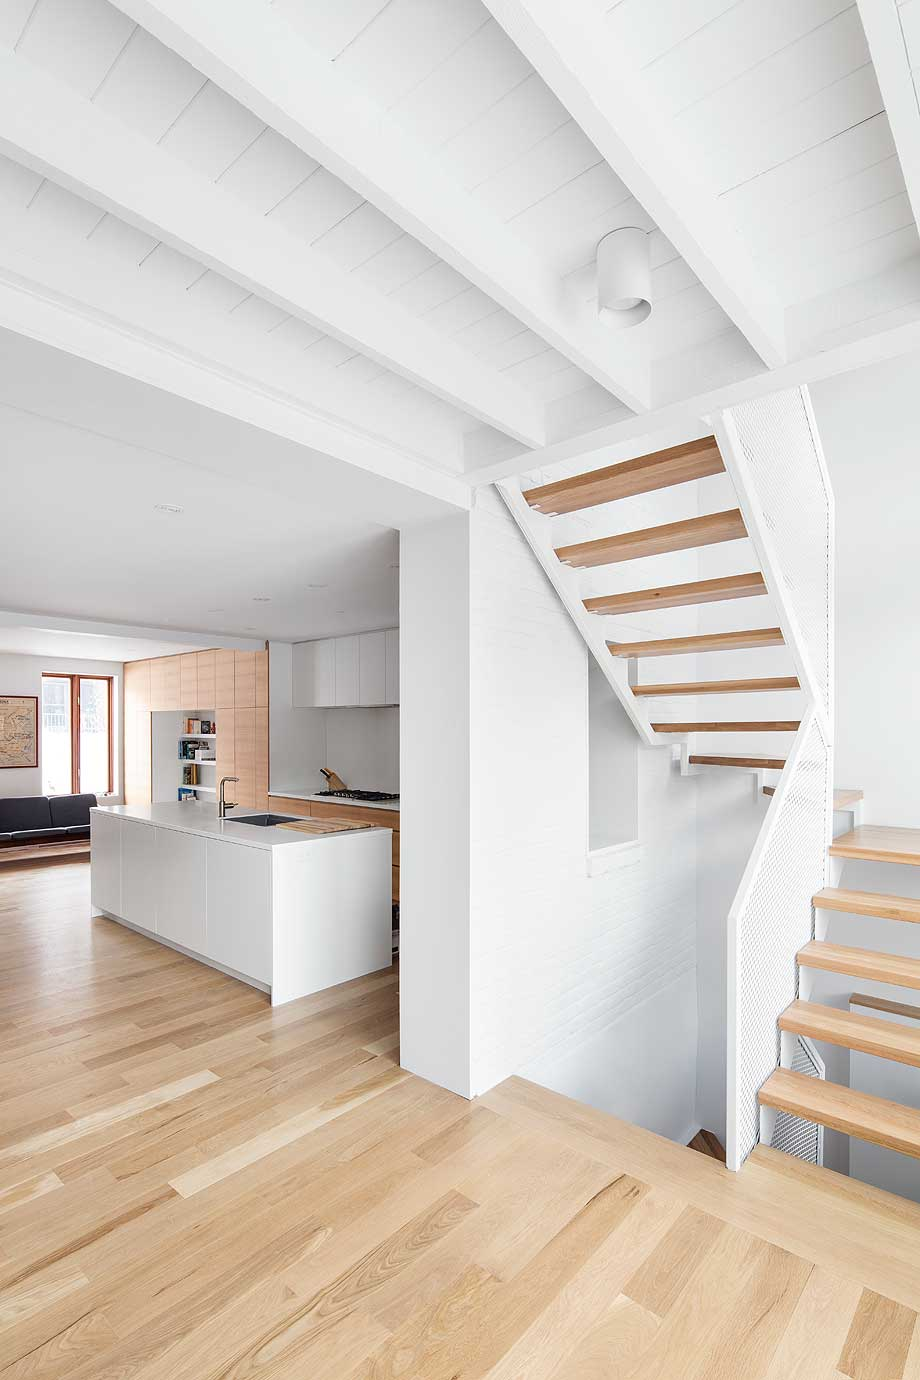 hotel-de-ville-residence-architecture-microclimat (3)